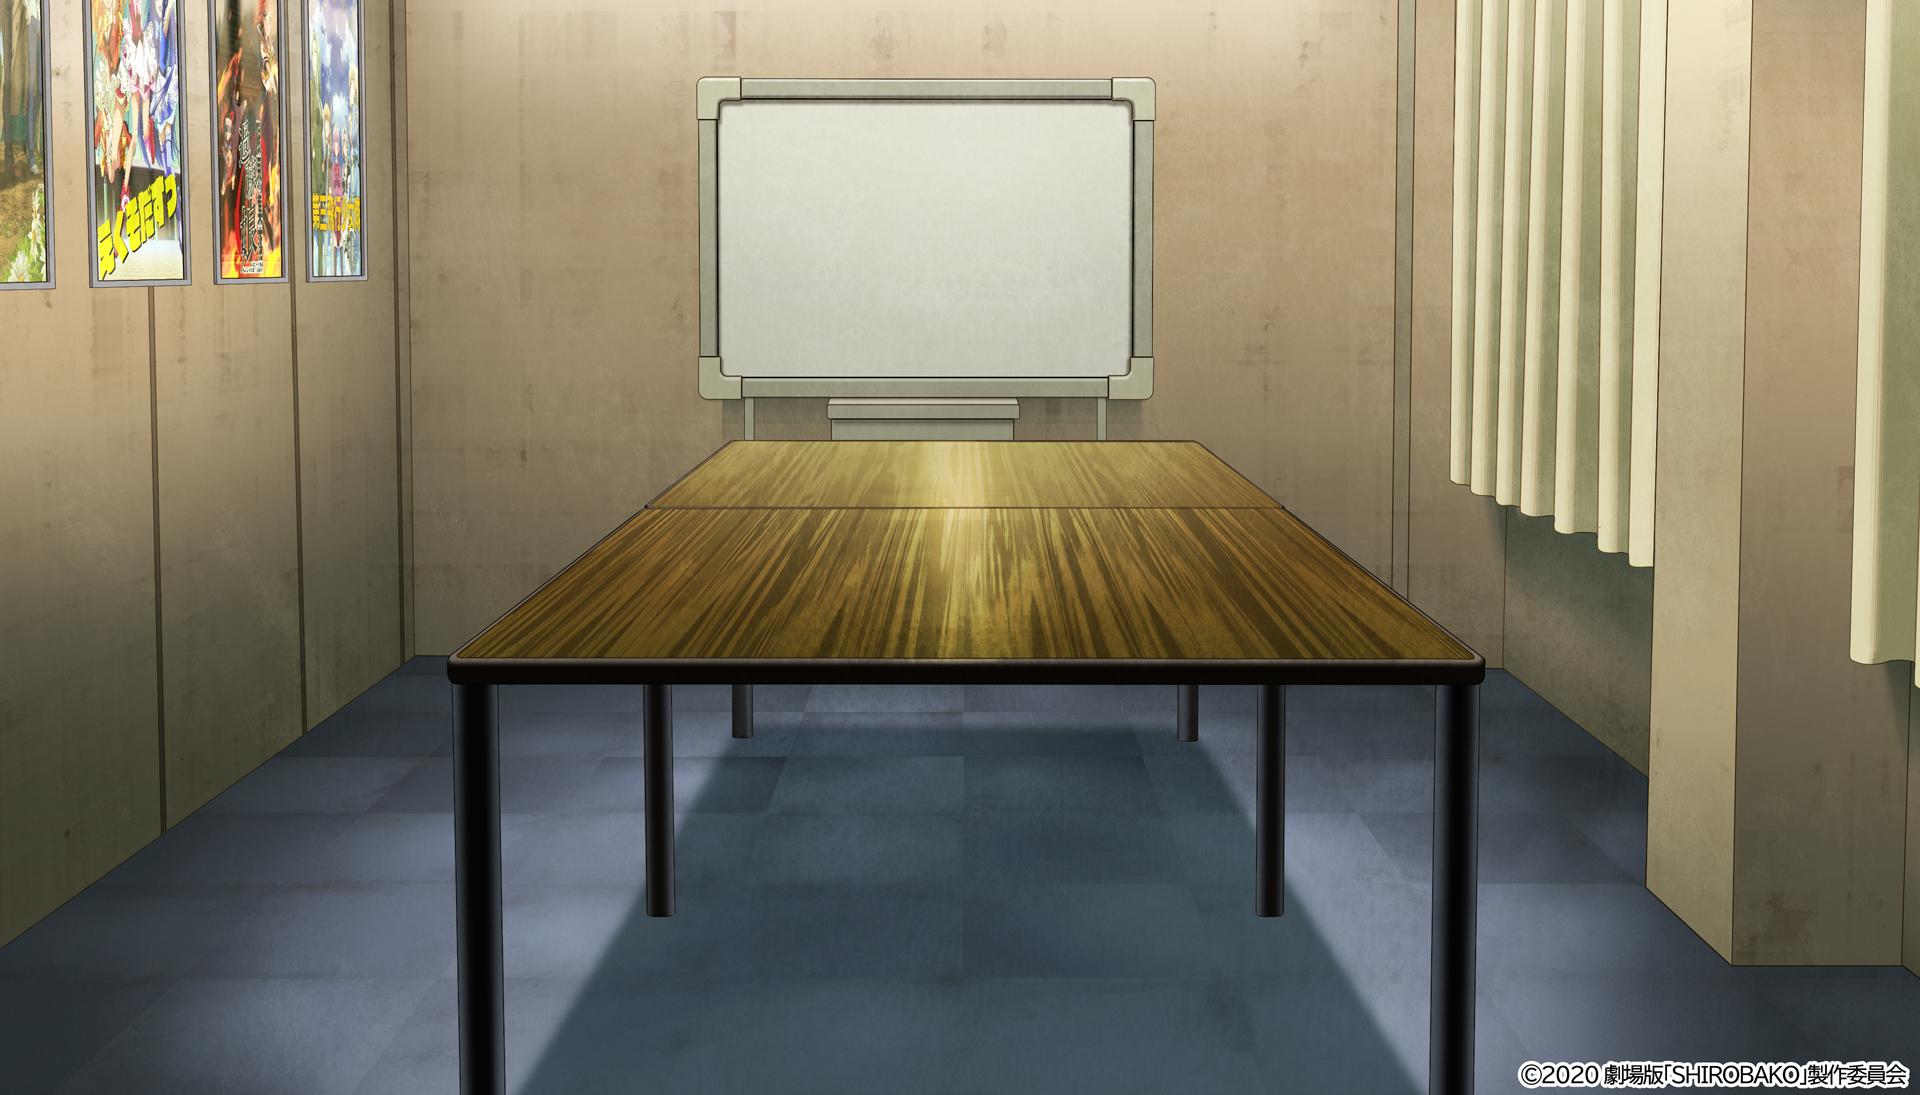 shirobako_anime 1248536202556239872_p0